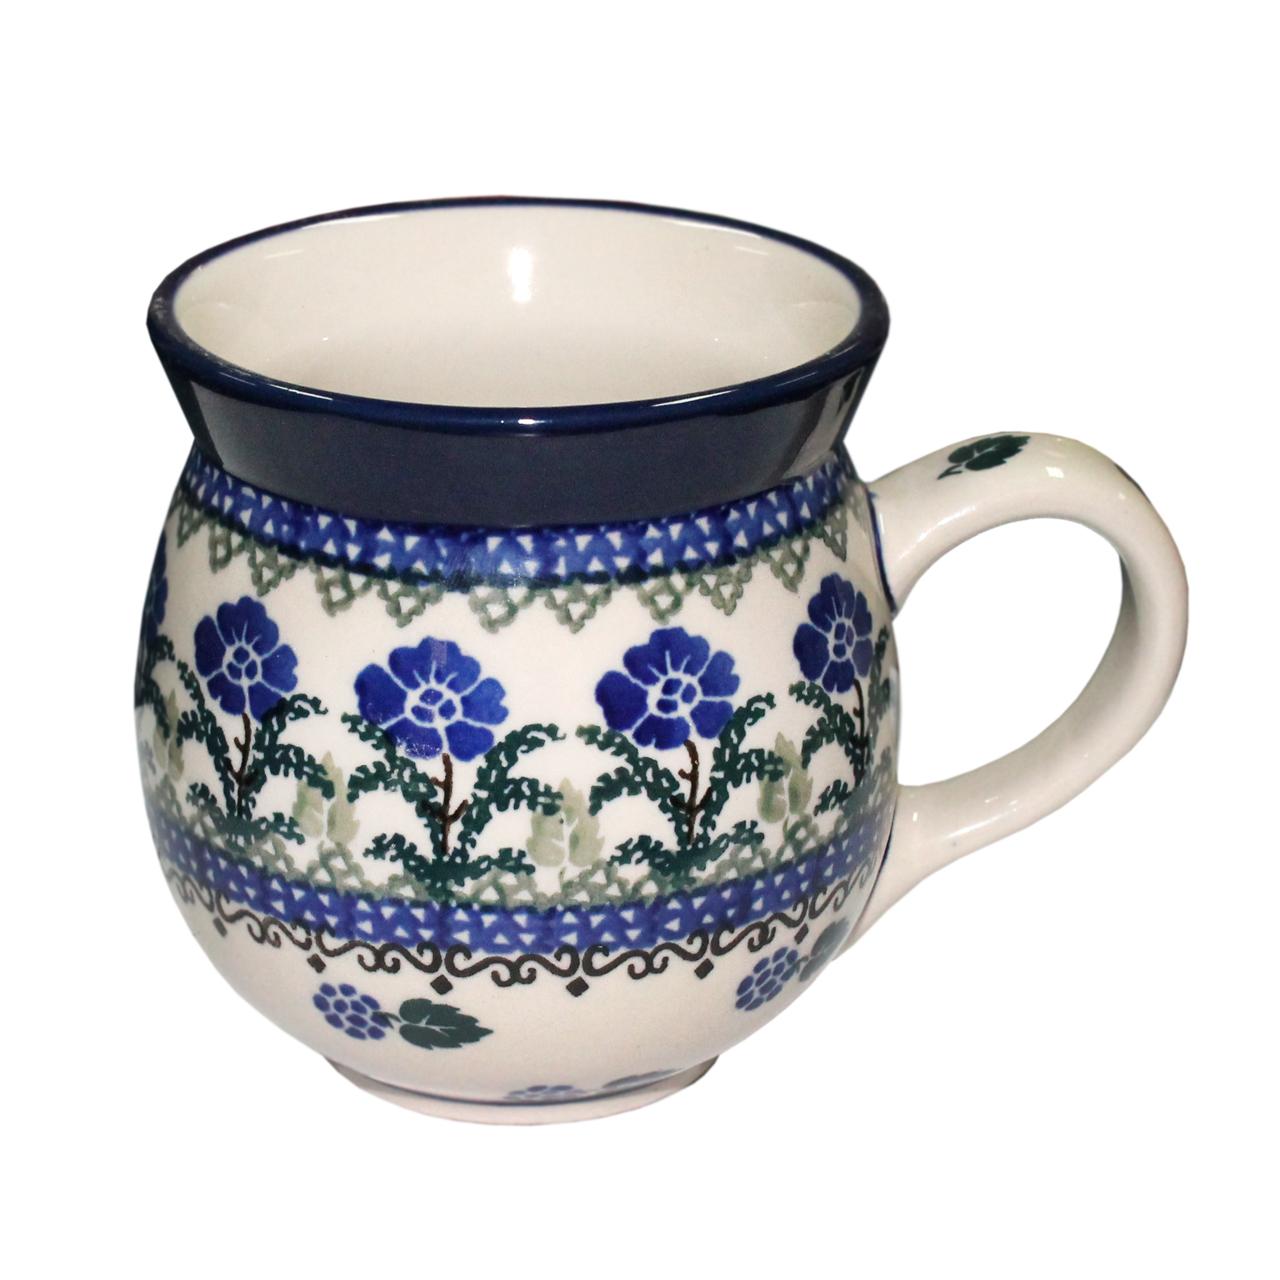 Cana Bombata Din Ceramica Crem Cu Flori 10.5 Cm